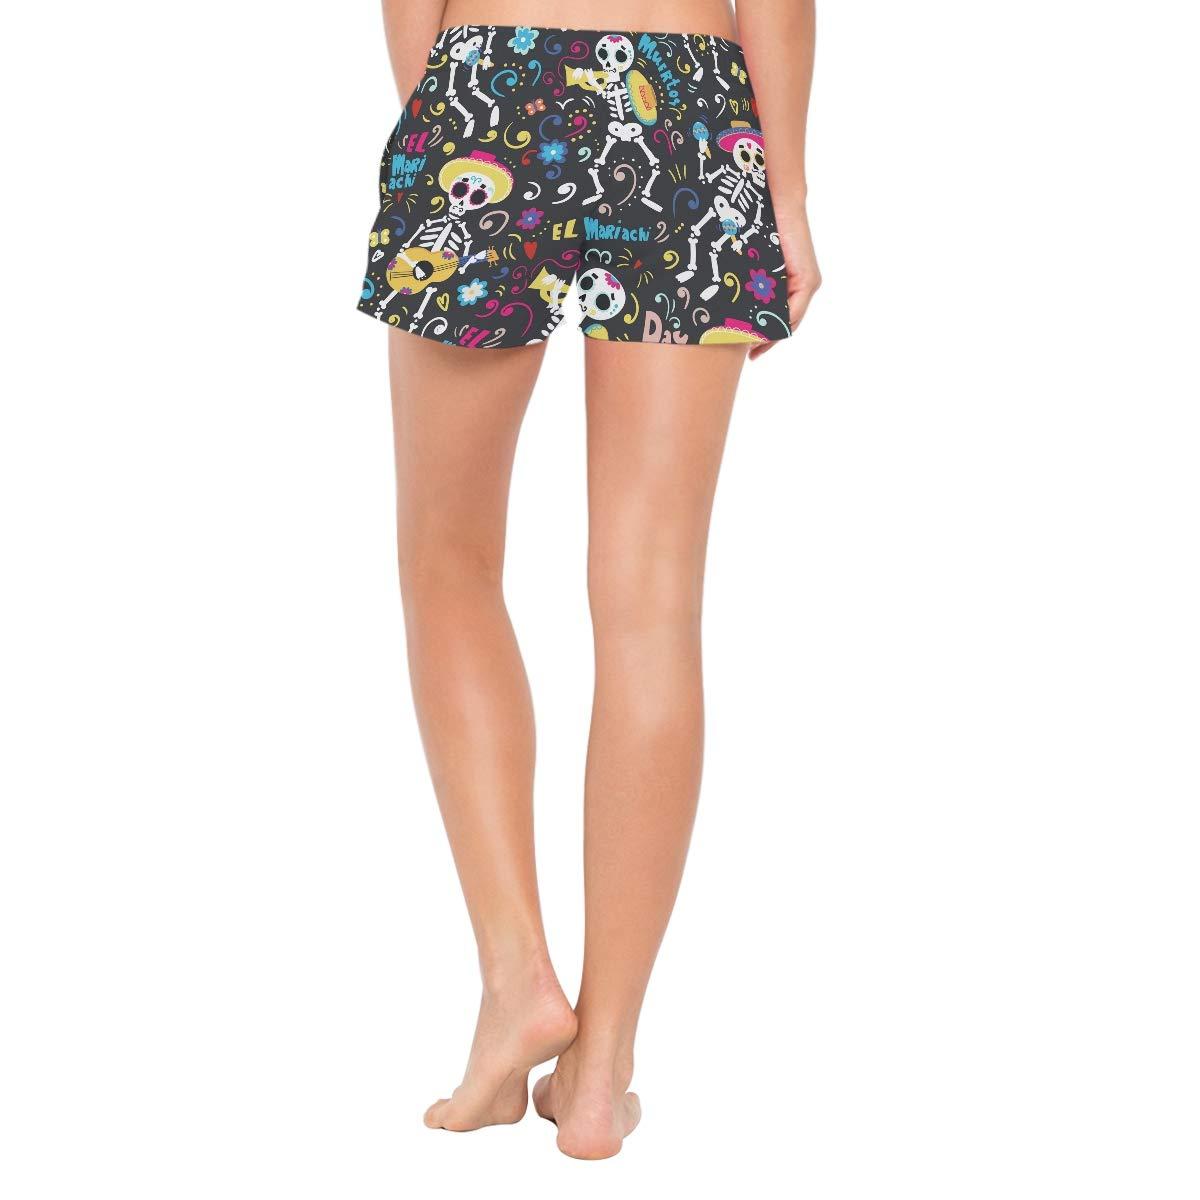 L Depaga Cartoon Skull Womens Board Shorts with Pockets Quick Dry Drawstring Beach Swim Trunks S